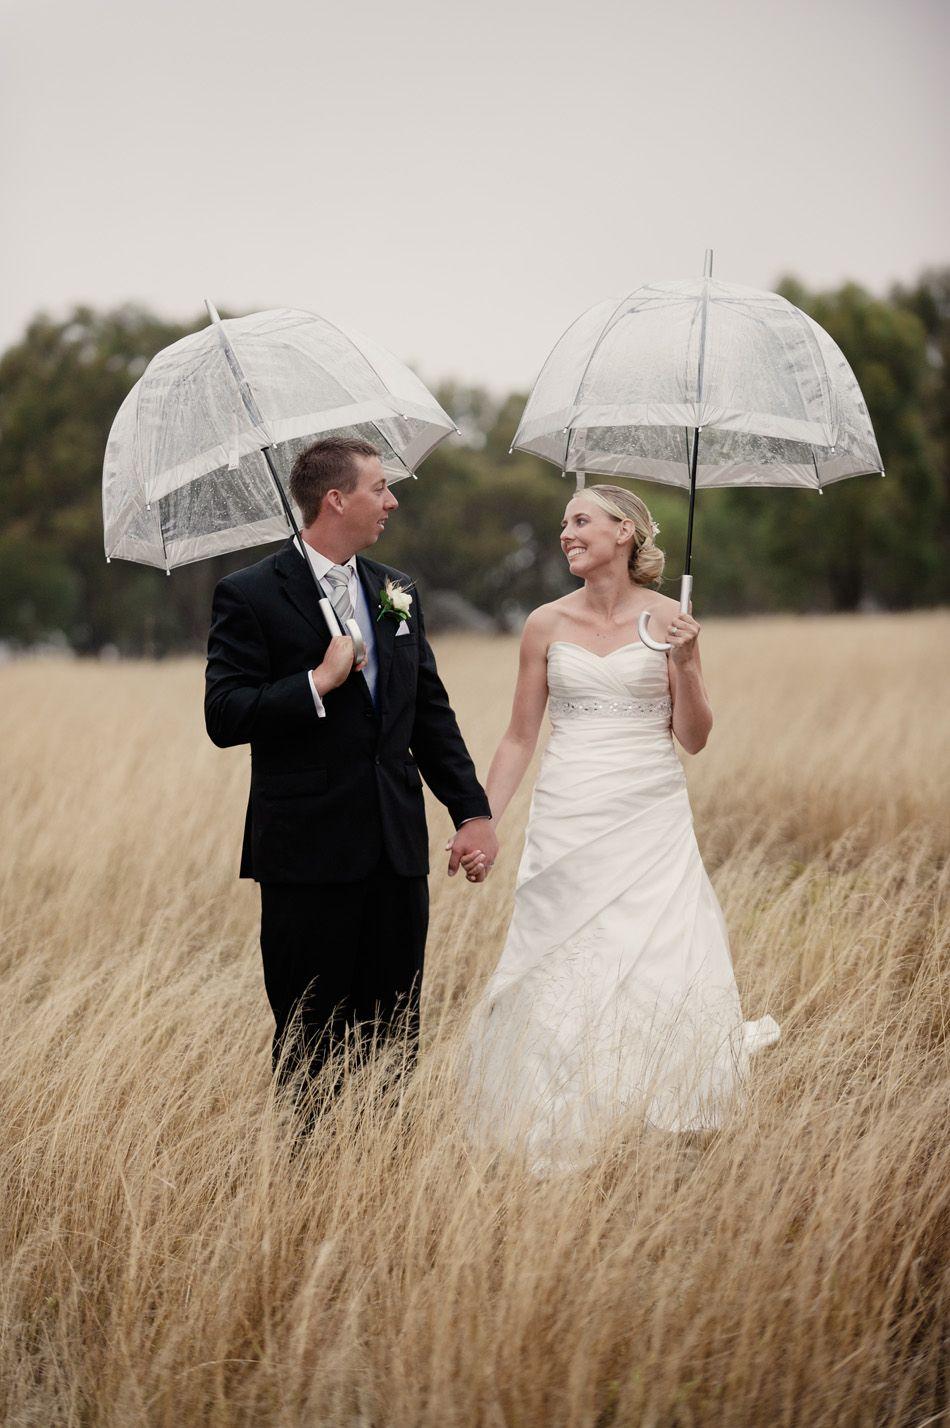 Pin by Lisaliebt.de on Unforgettable Moments   Wedding